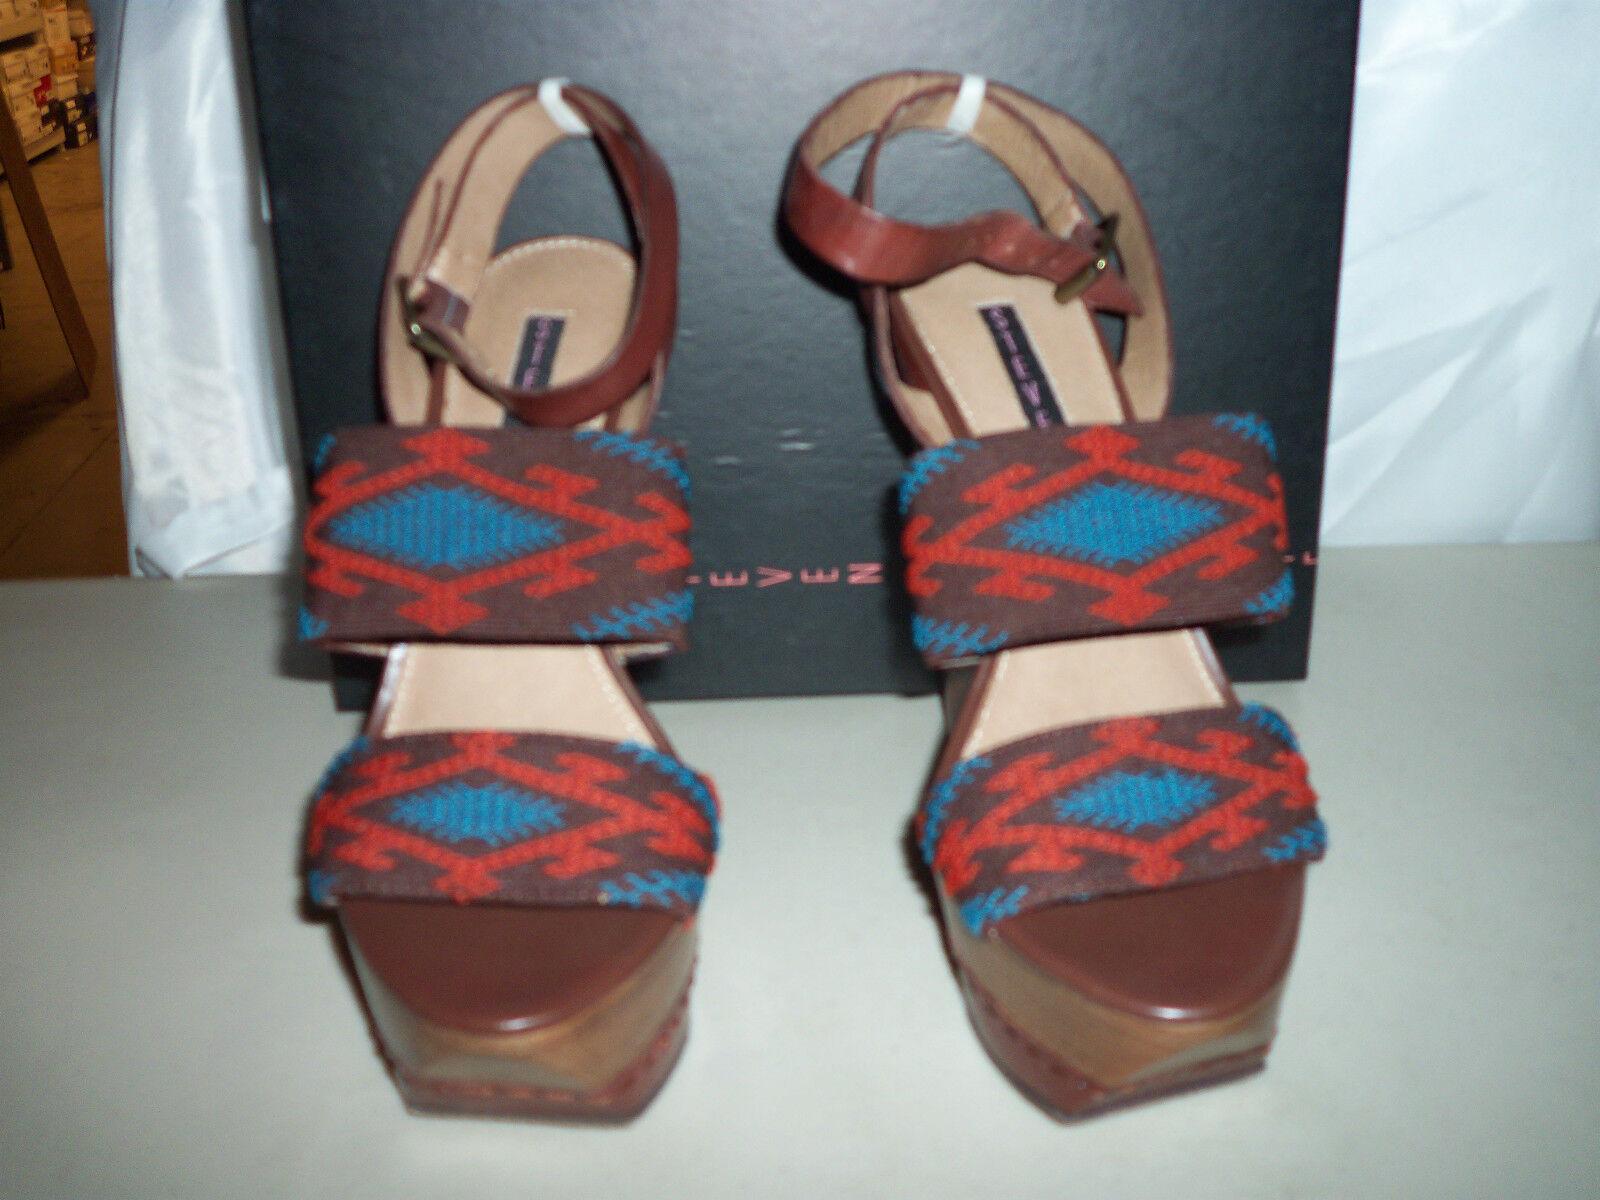 Steven NEU Damenschuhe Bernidet Multi Fabric Wedge Heels 7.5 M Schuhes